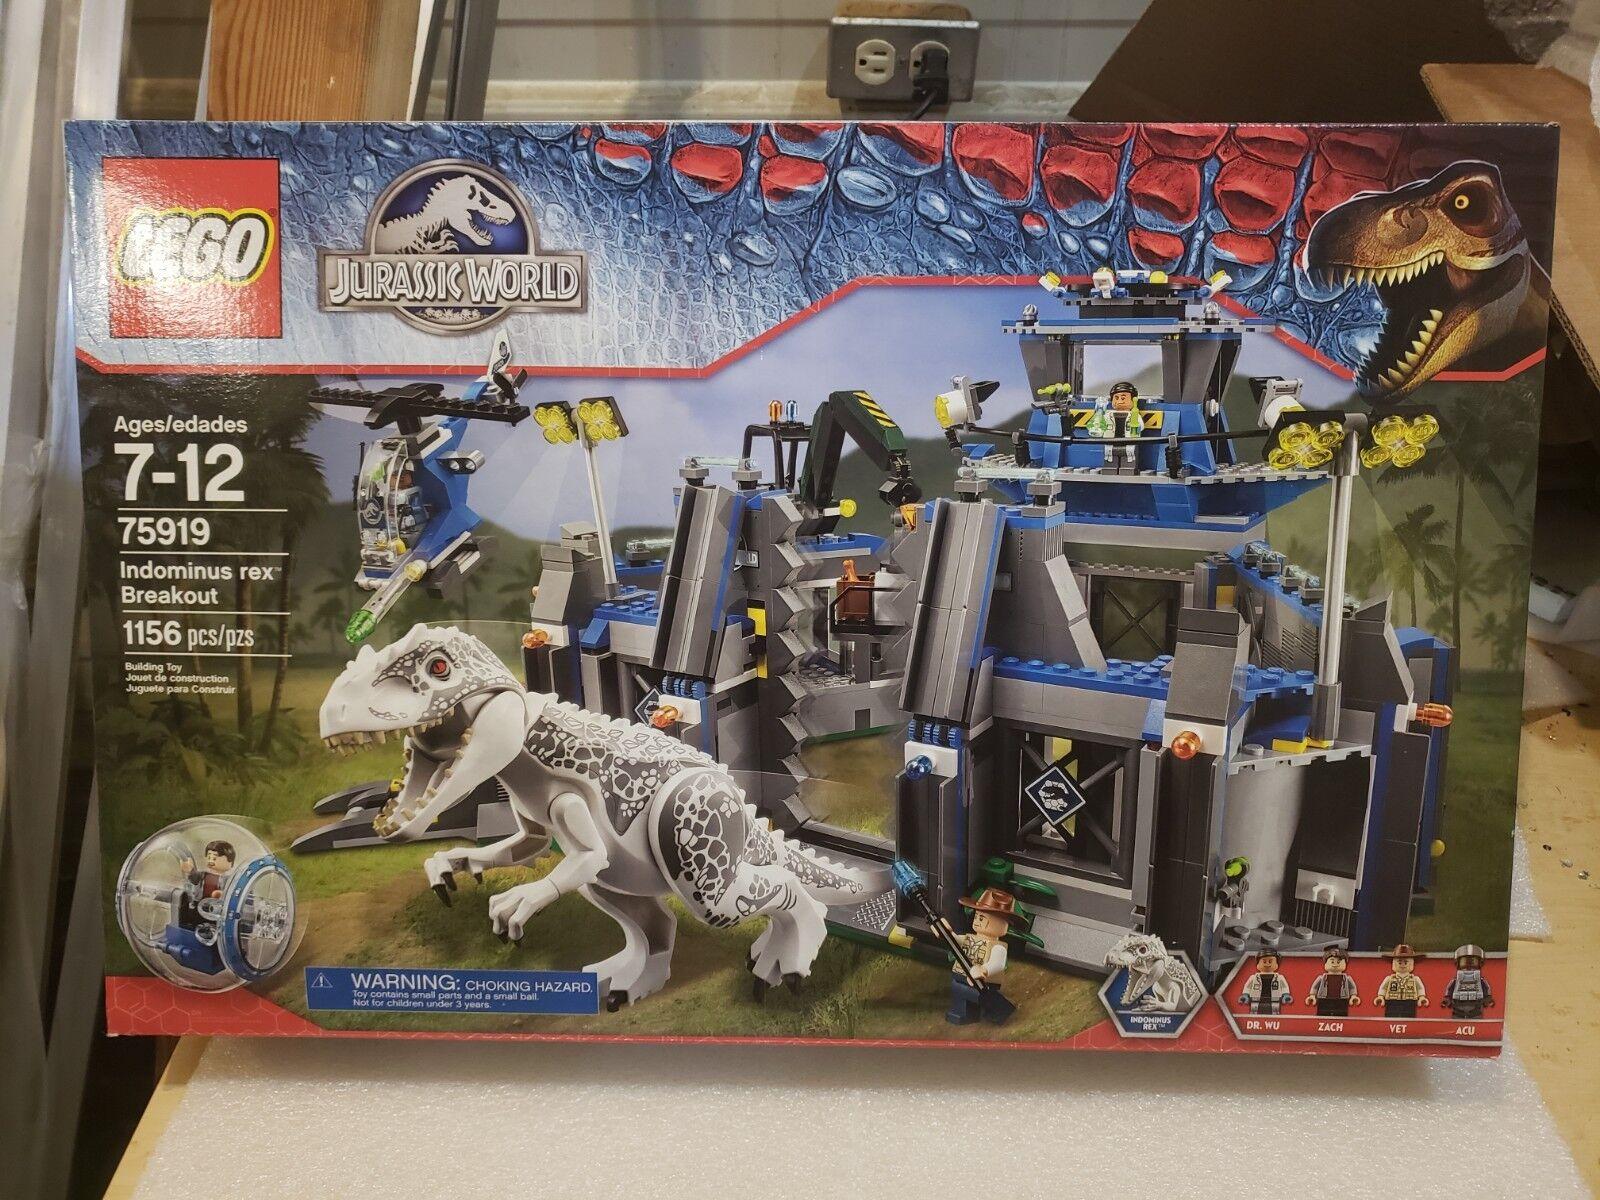 LEGO Jurassic World 75919 Indominus Rex Breakout - NISB - Retirot